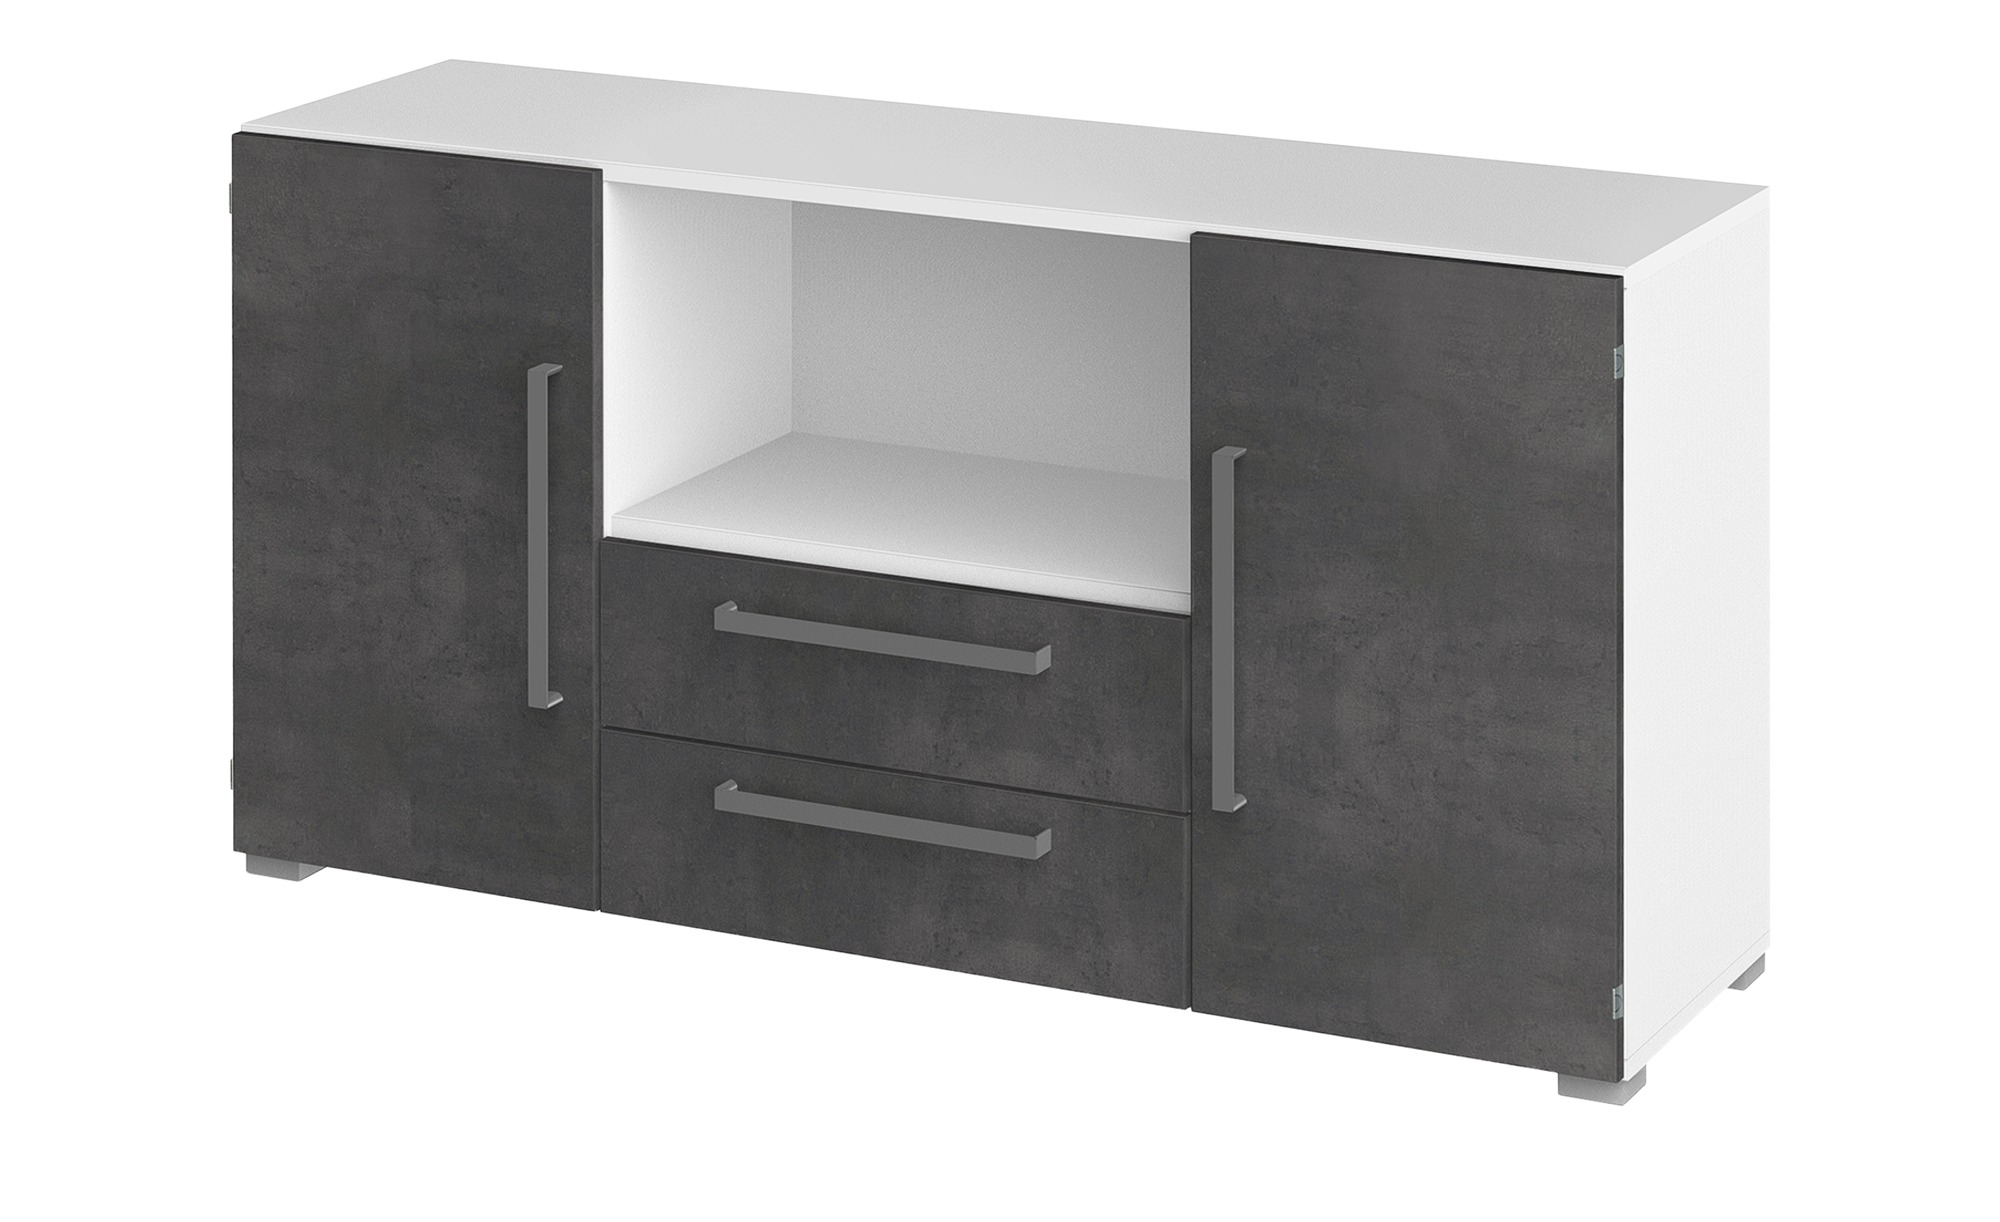 Sideboard  Objekt plus ¦ grau ¦ Maße (cm): B: 140 H: 74,5 T: 41,9 Kommoden & Sideboards > Sideboards - Höffner